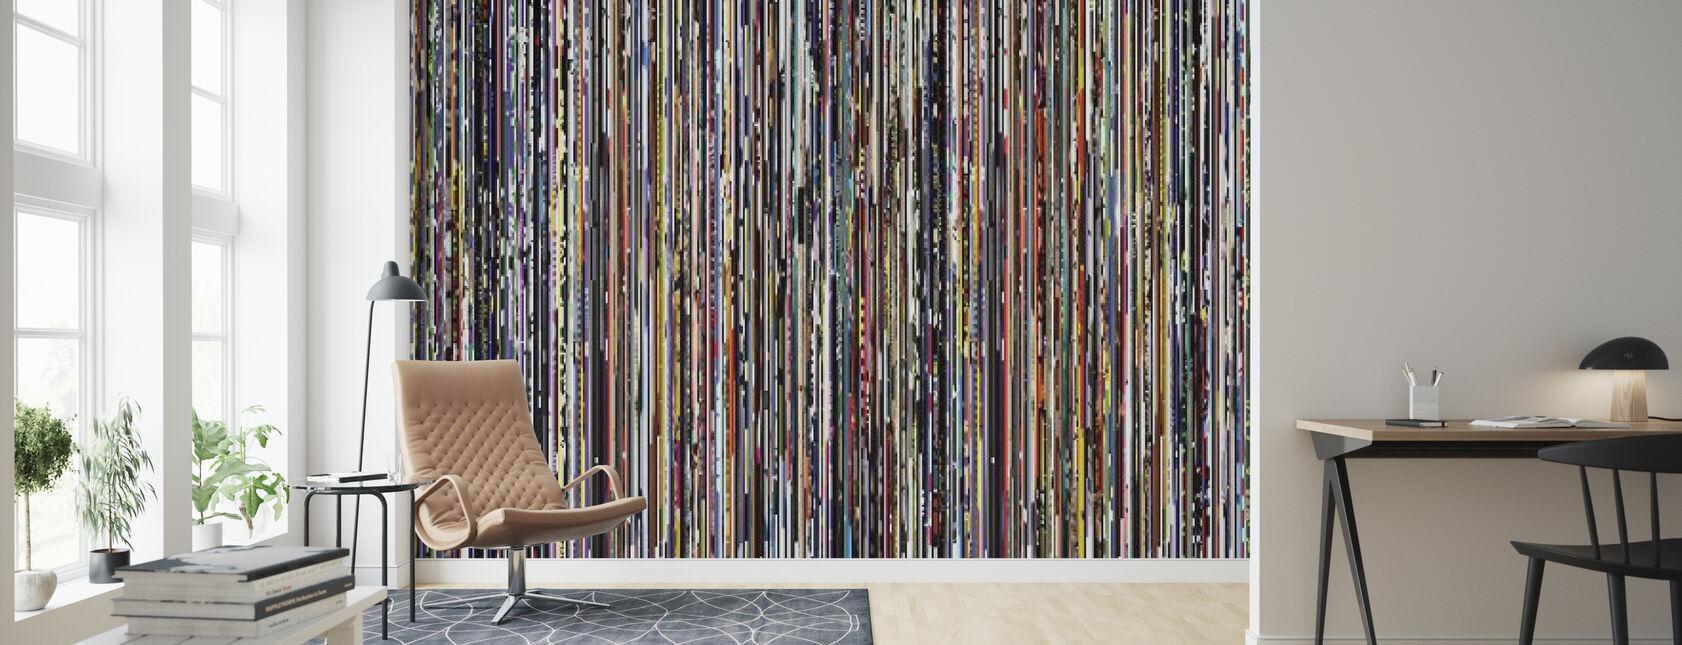 - Datrix - Wallpaper - Living Room